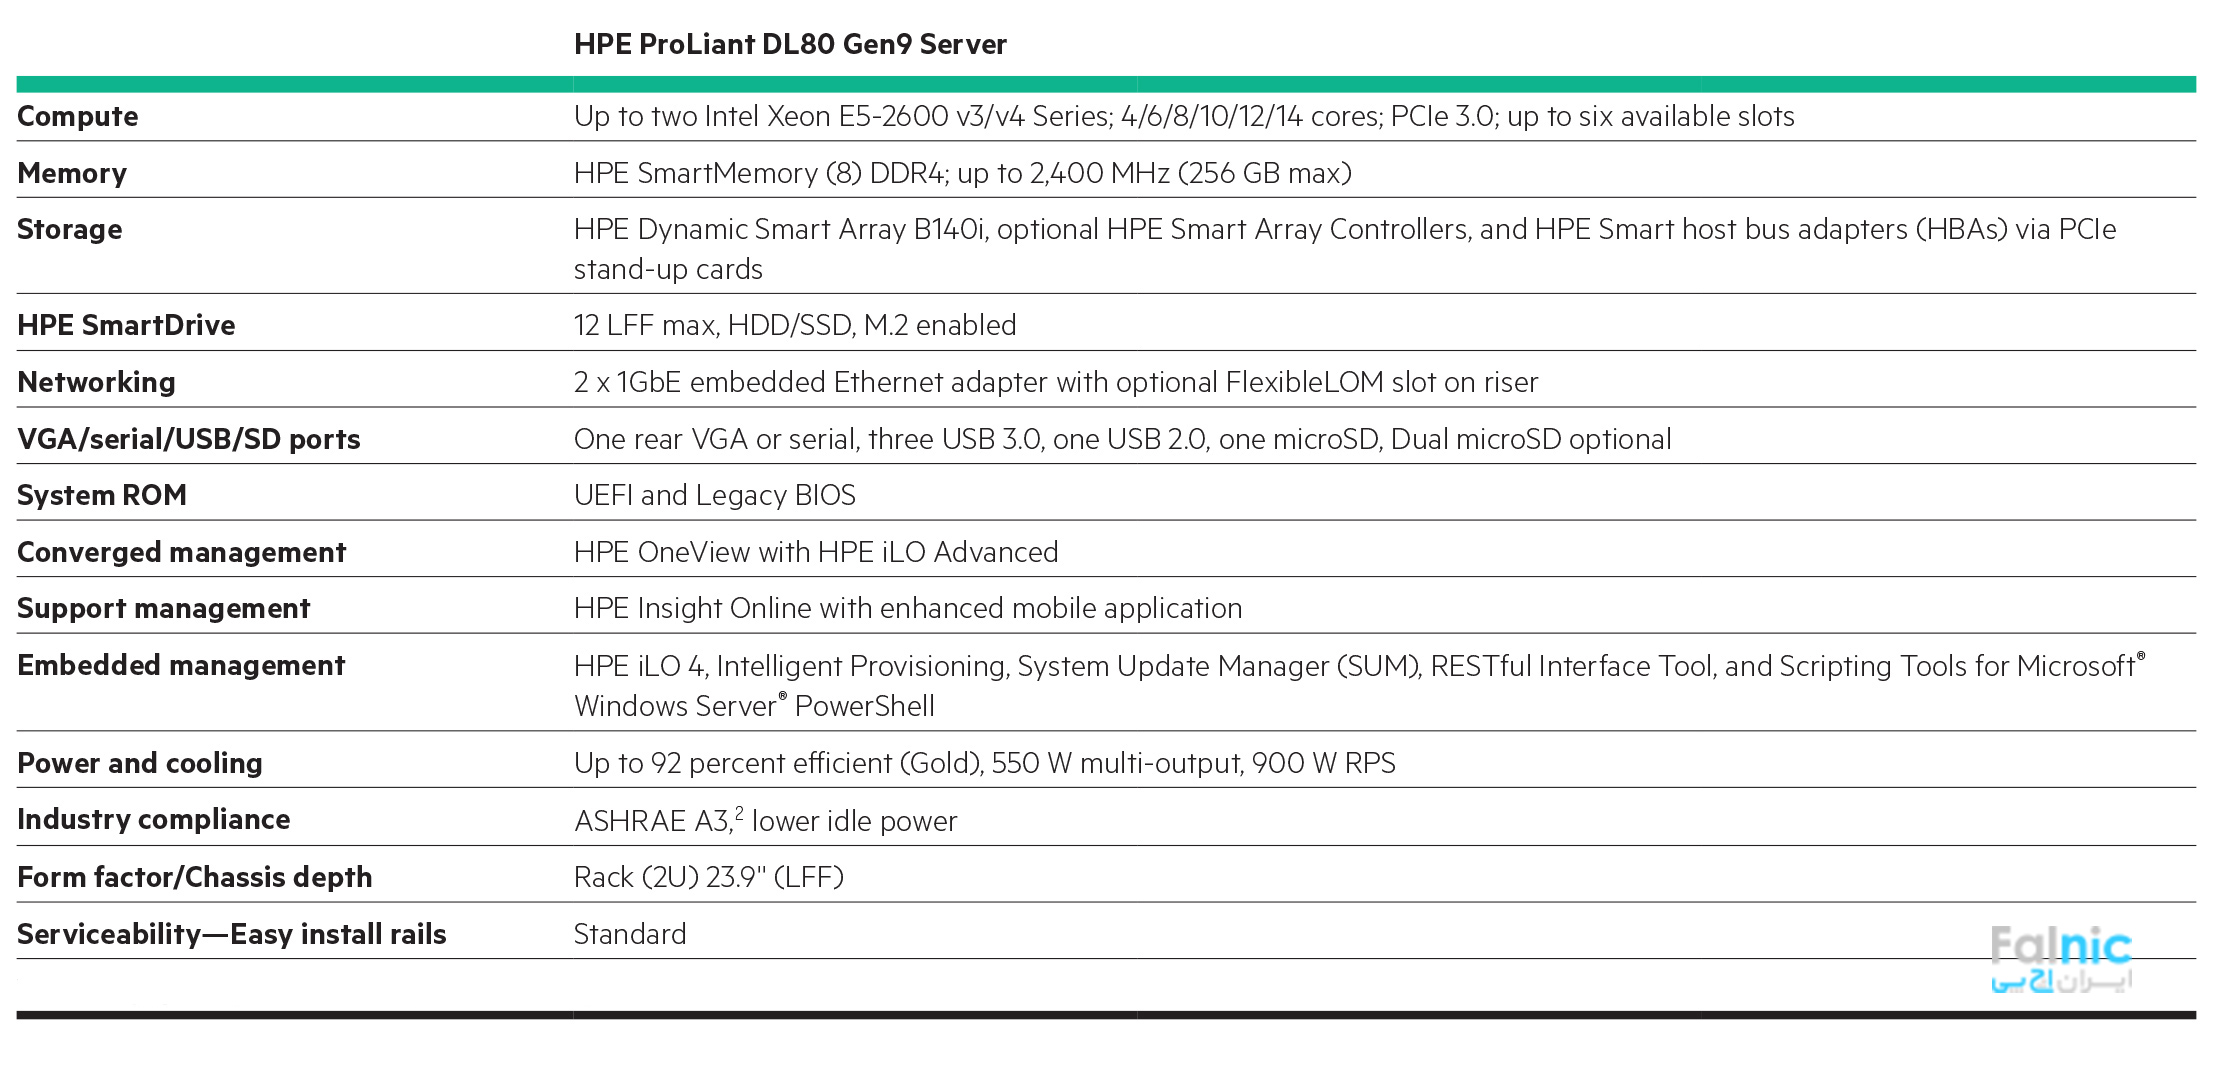 سرور HPE ProLiant DL80 Gen9